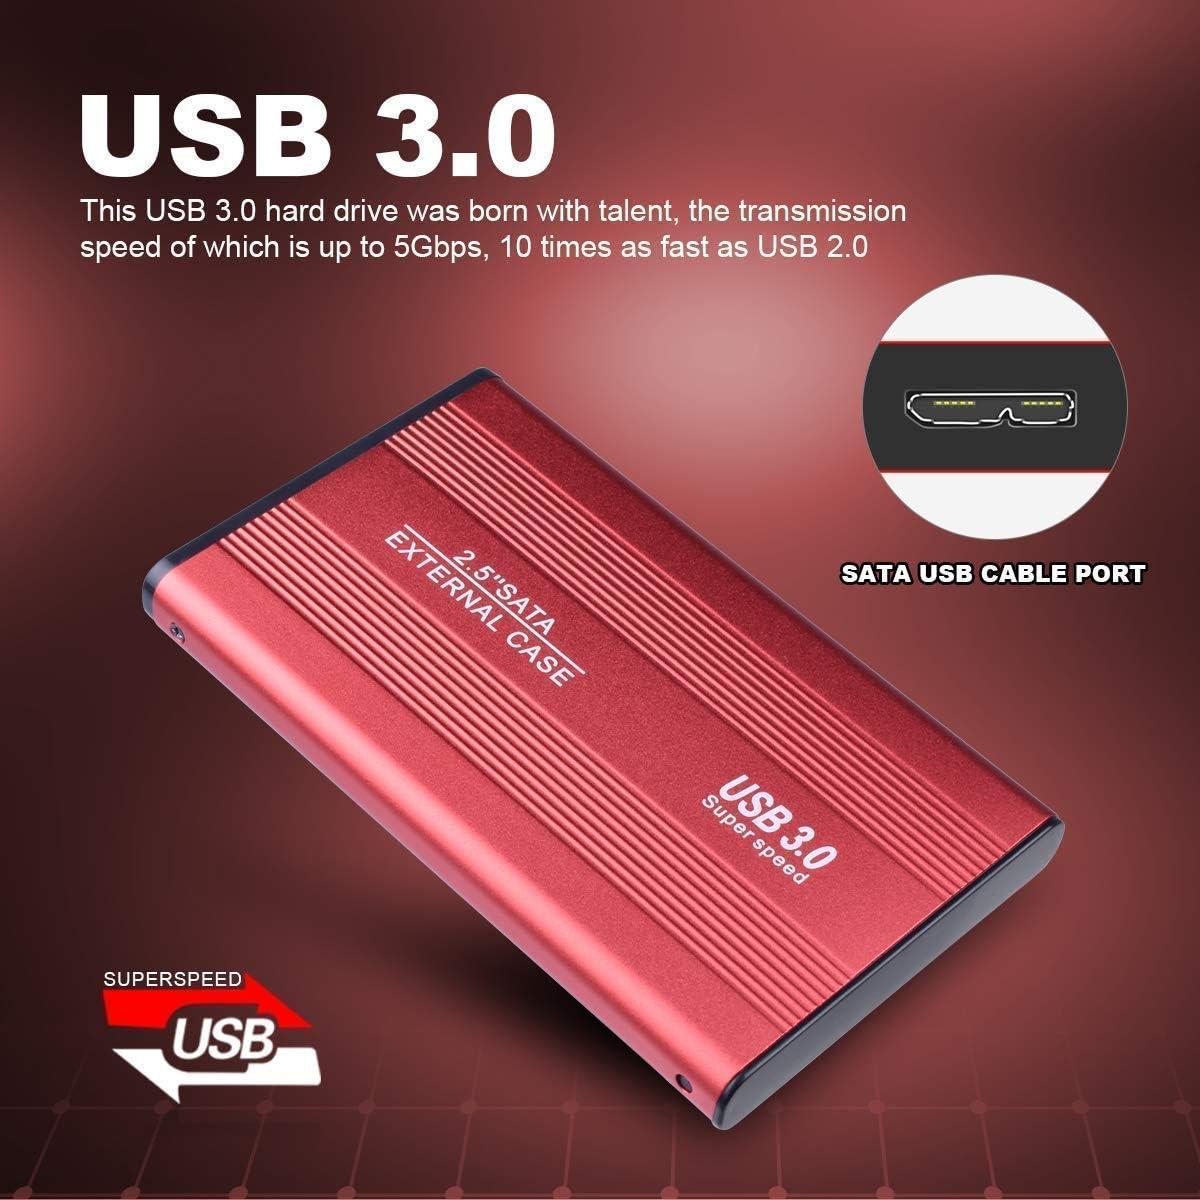 Xbox One Mac 1 TB 2 TB de disco duro ultradelgado USB 3.0 port/átil almacenamiento externo para PC 1 TB, plata Disco duro externo port/átil